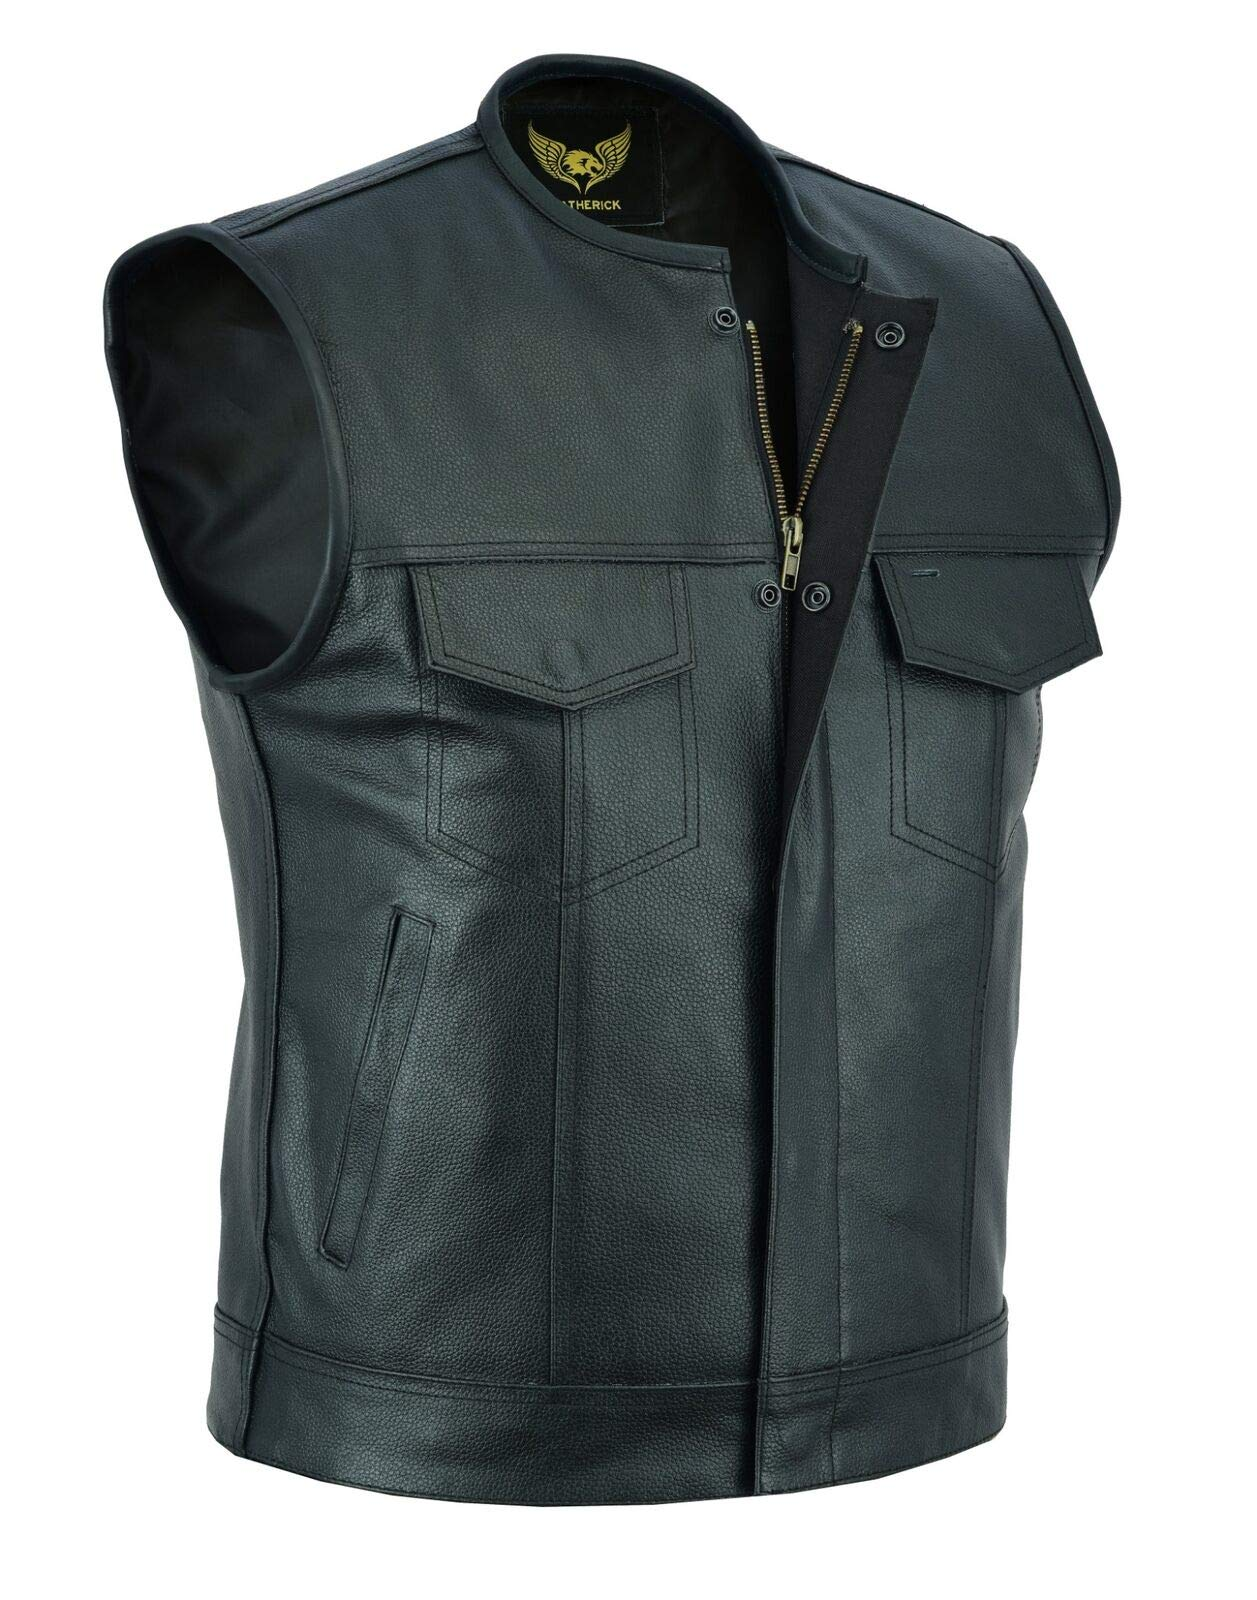 DP Vests Men's SOA Collarless Leather Vest Motorcycle Biker Club Concealed Carry Outlaws (XXX-Large) Black